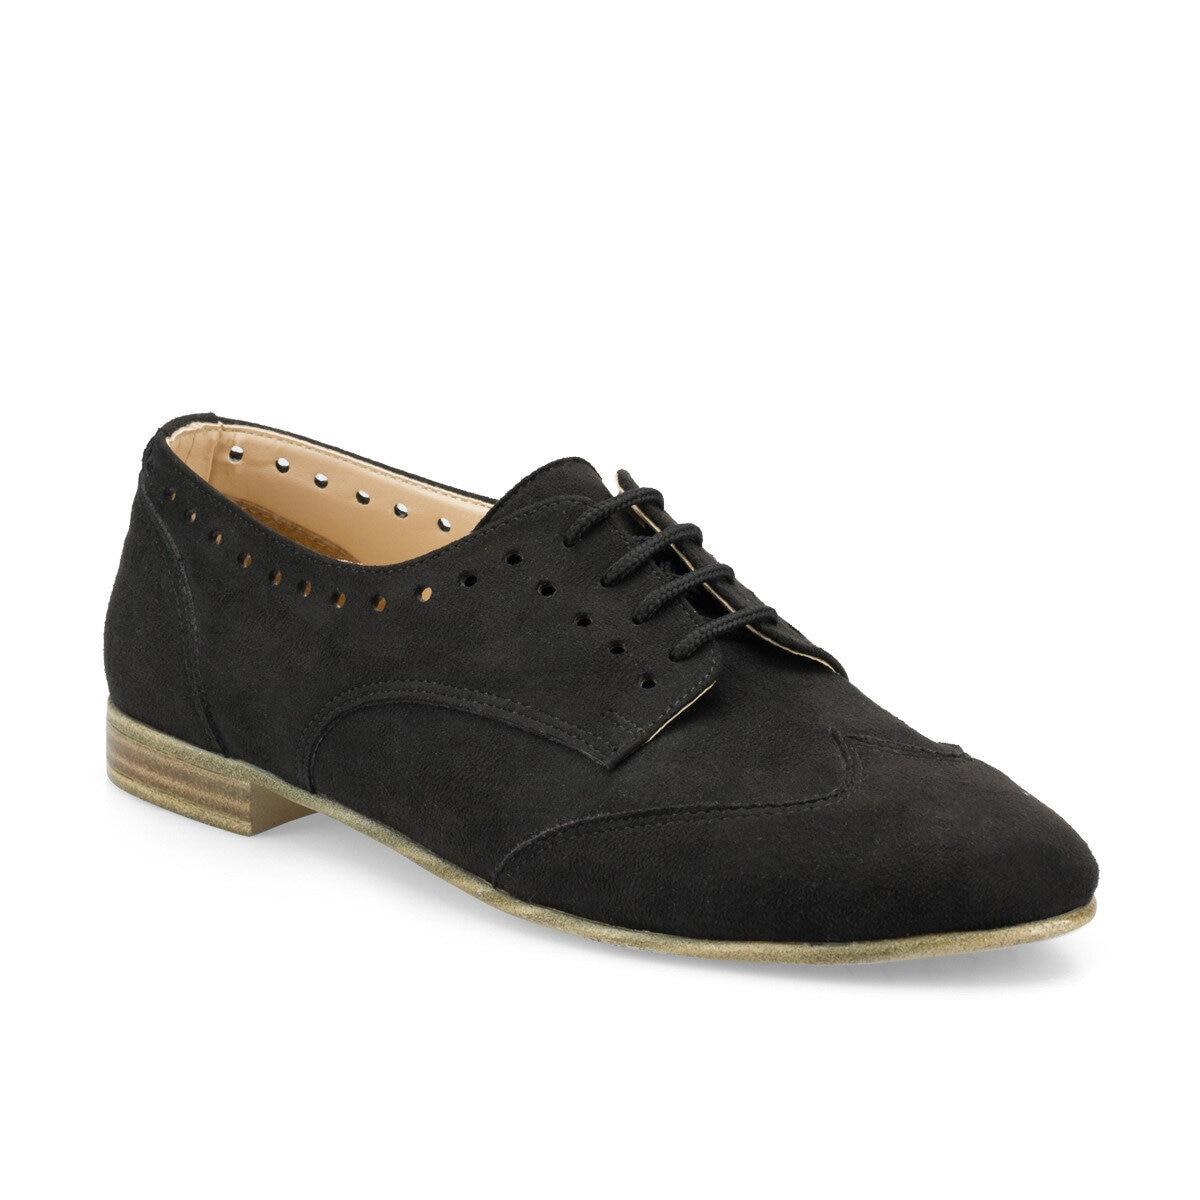 FLO 315099.Z Beige Women Oxford Shoes Polaris